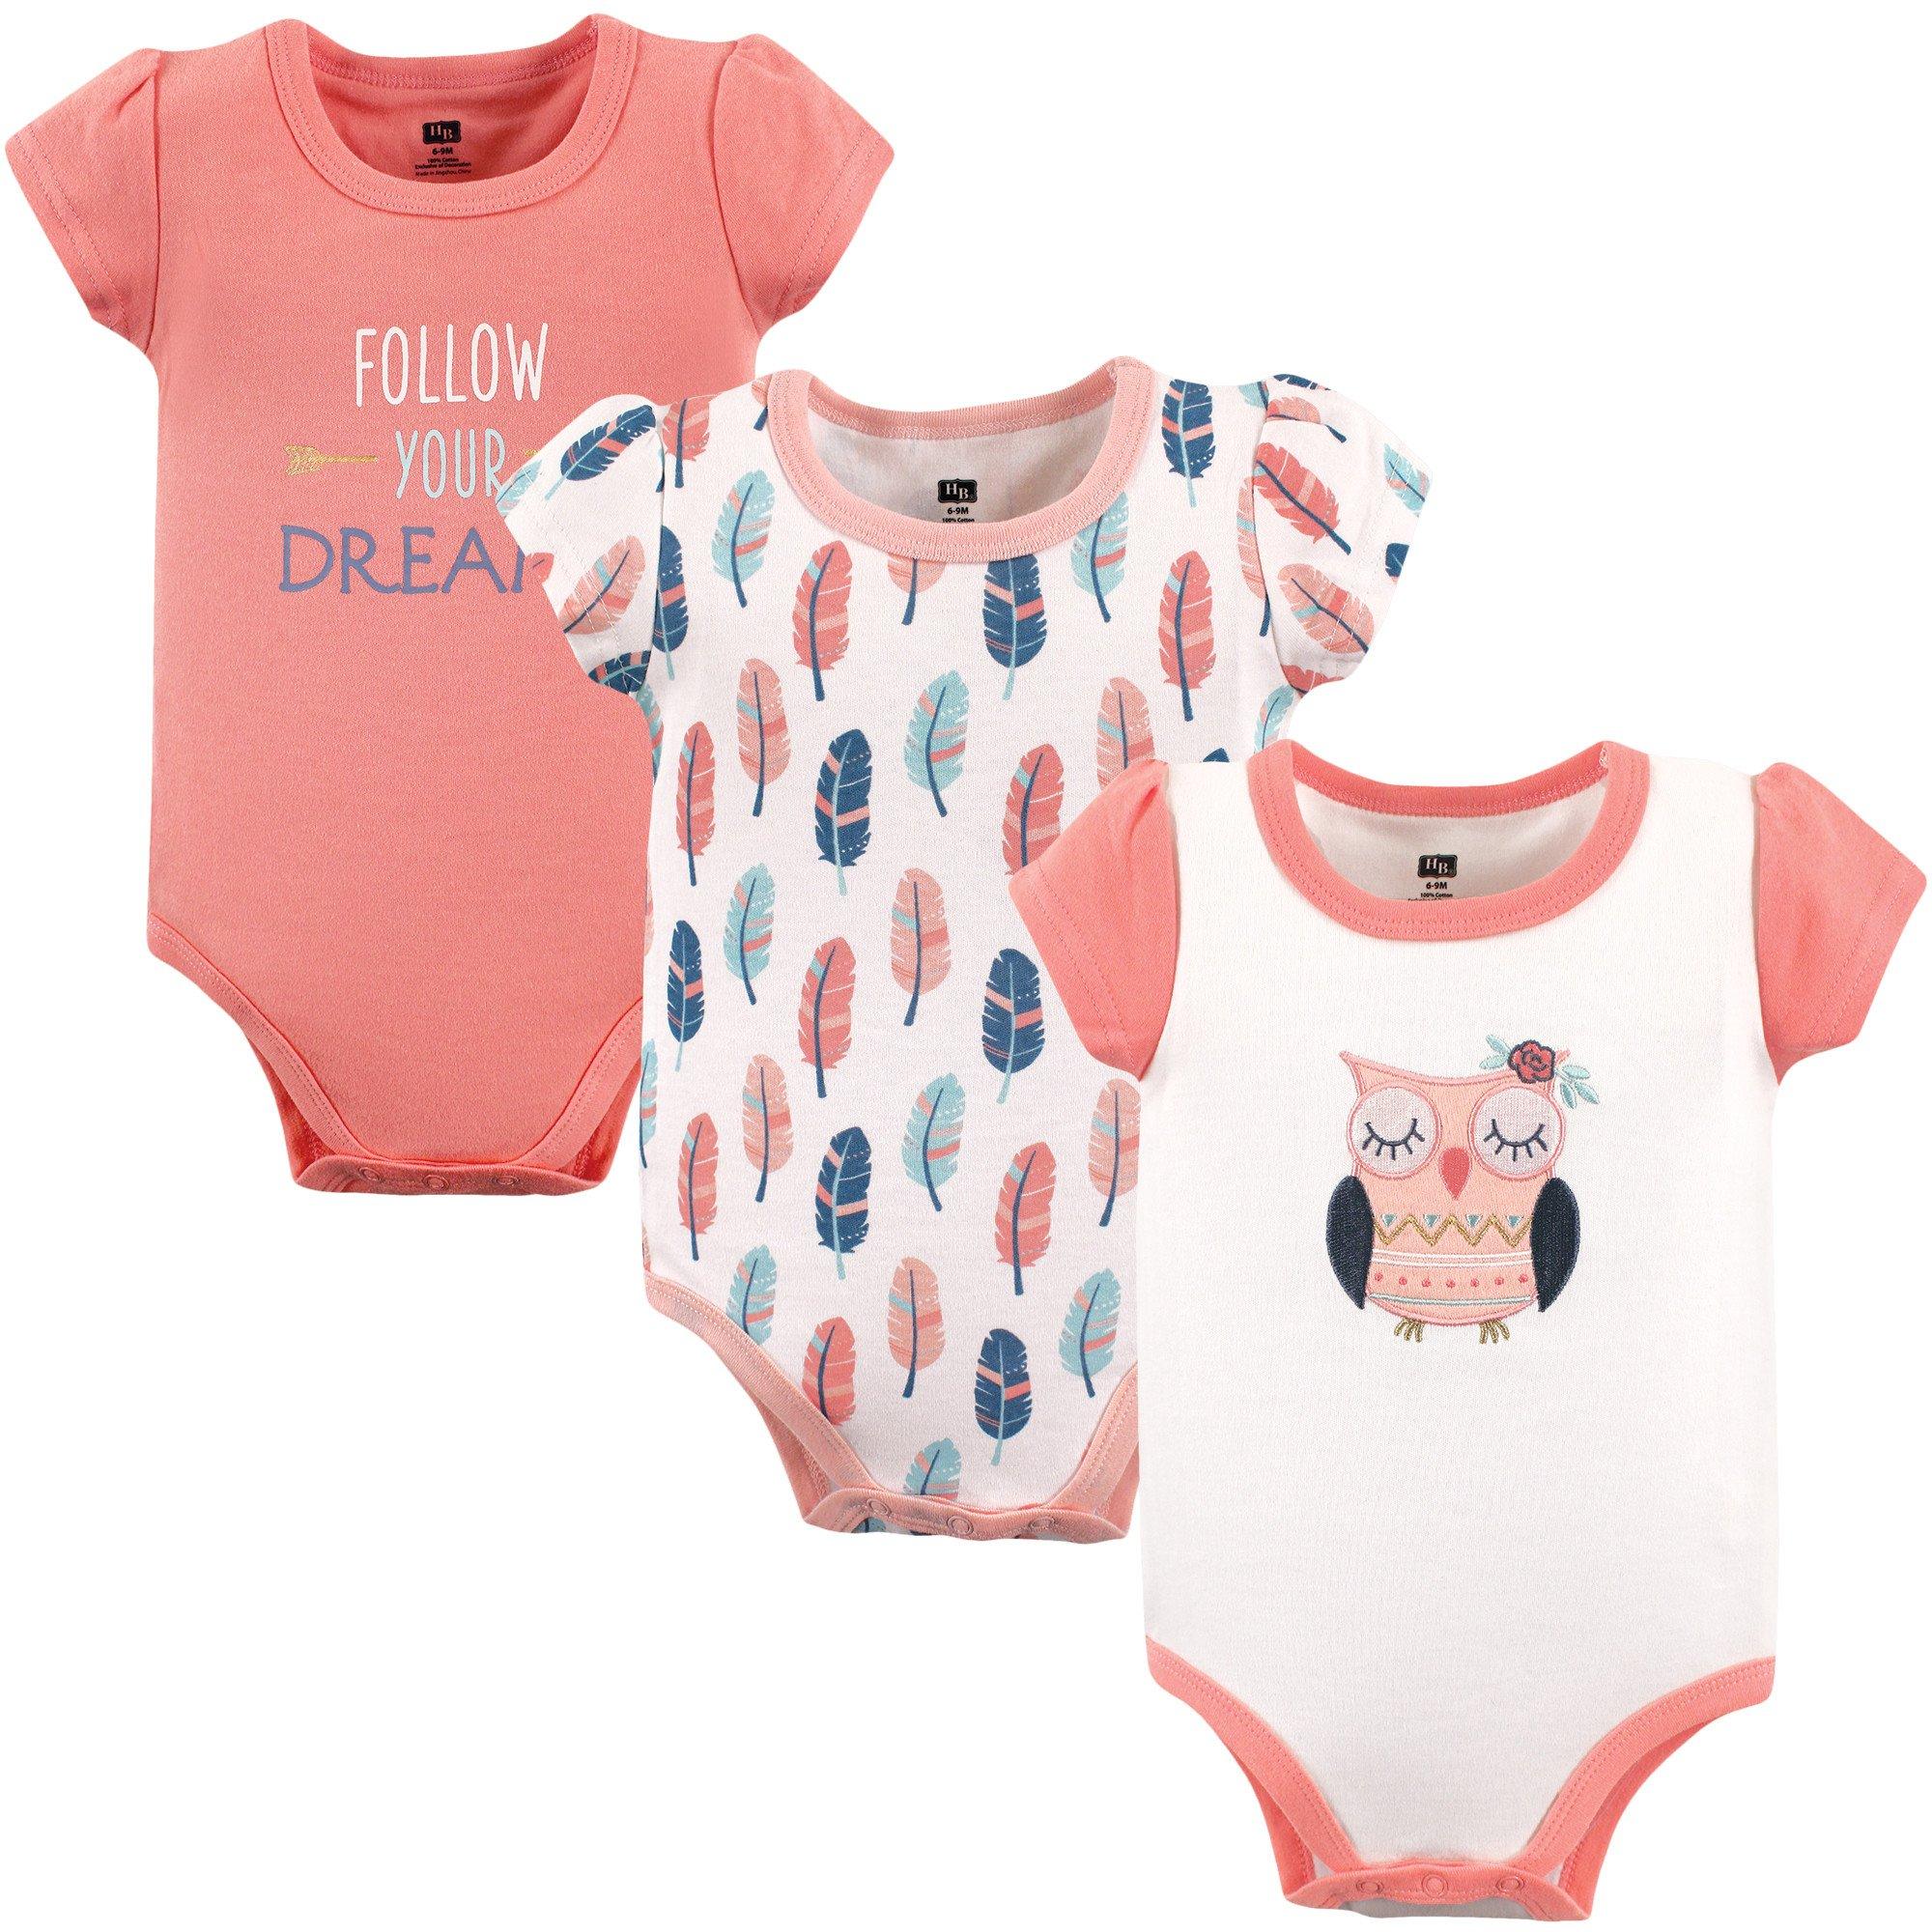 Hudson Baby Baby Infant Cotton Bodysuits, Follow